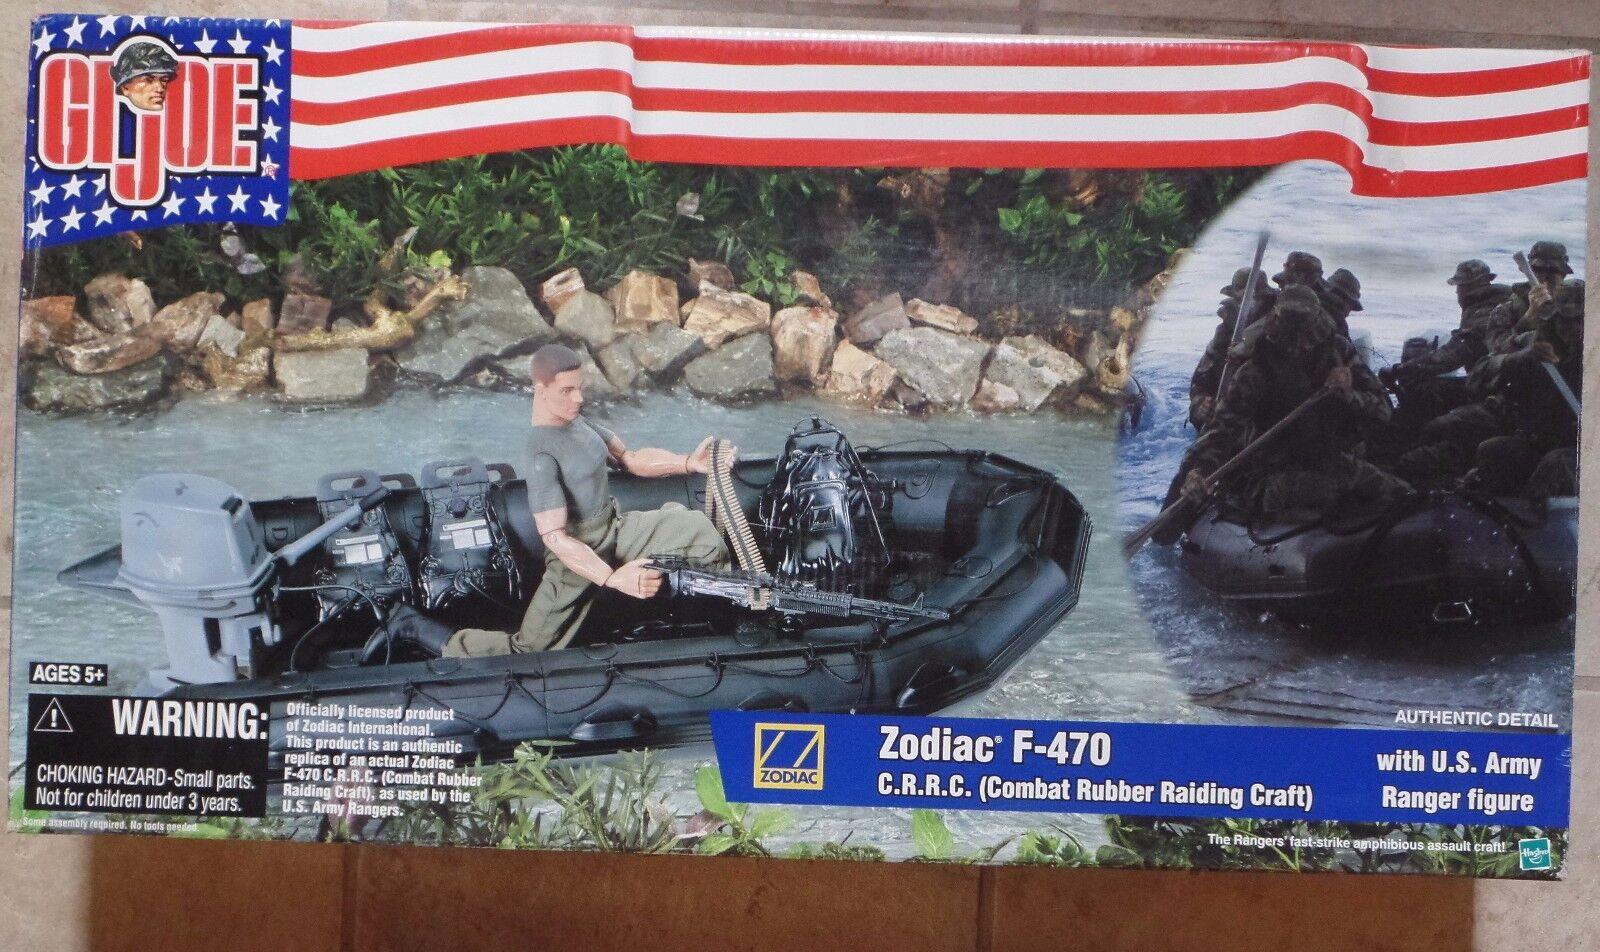 Gi Joe Zodiac F-470 c.r.r.c. con Us Army Ranger Figura Nuevo Sellado Menta en caja sellada 2002